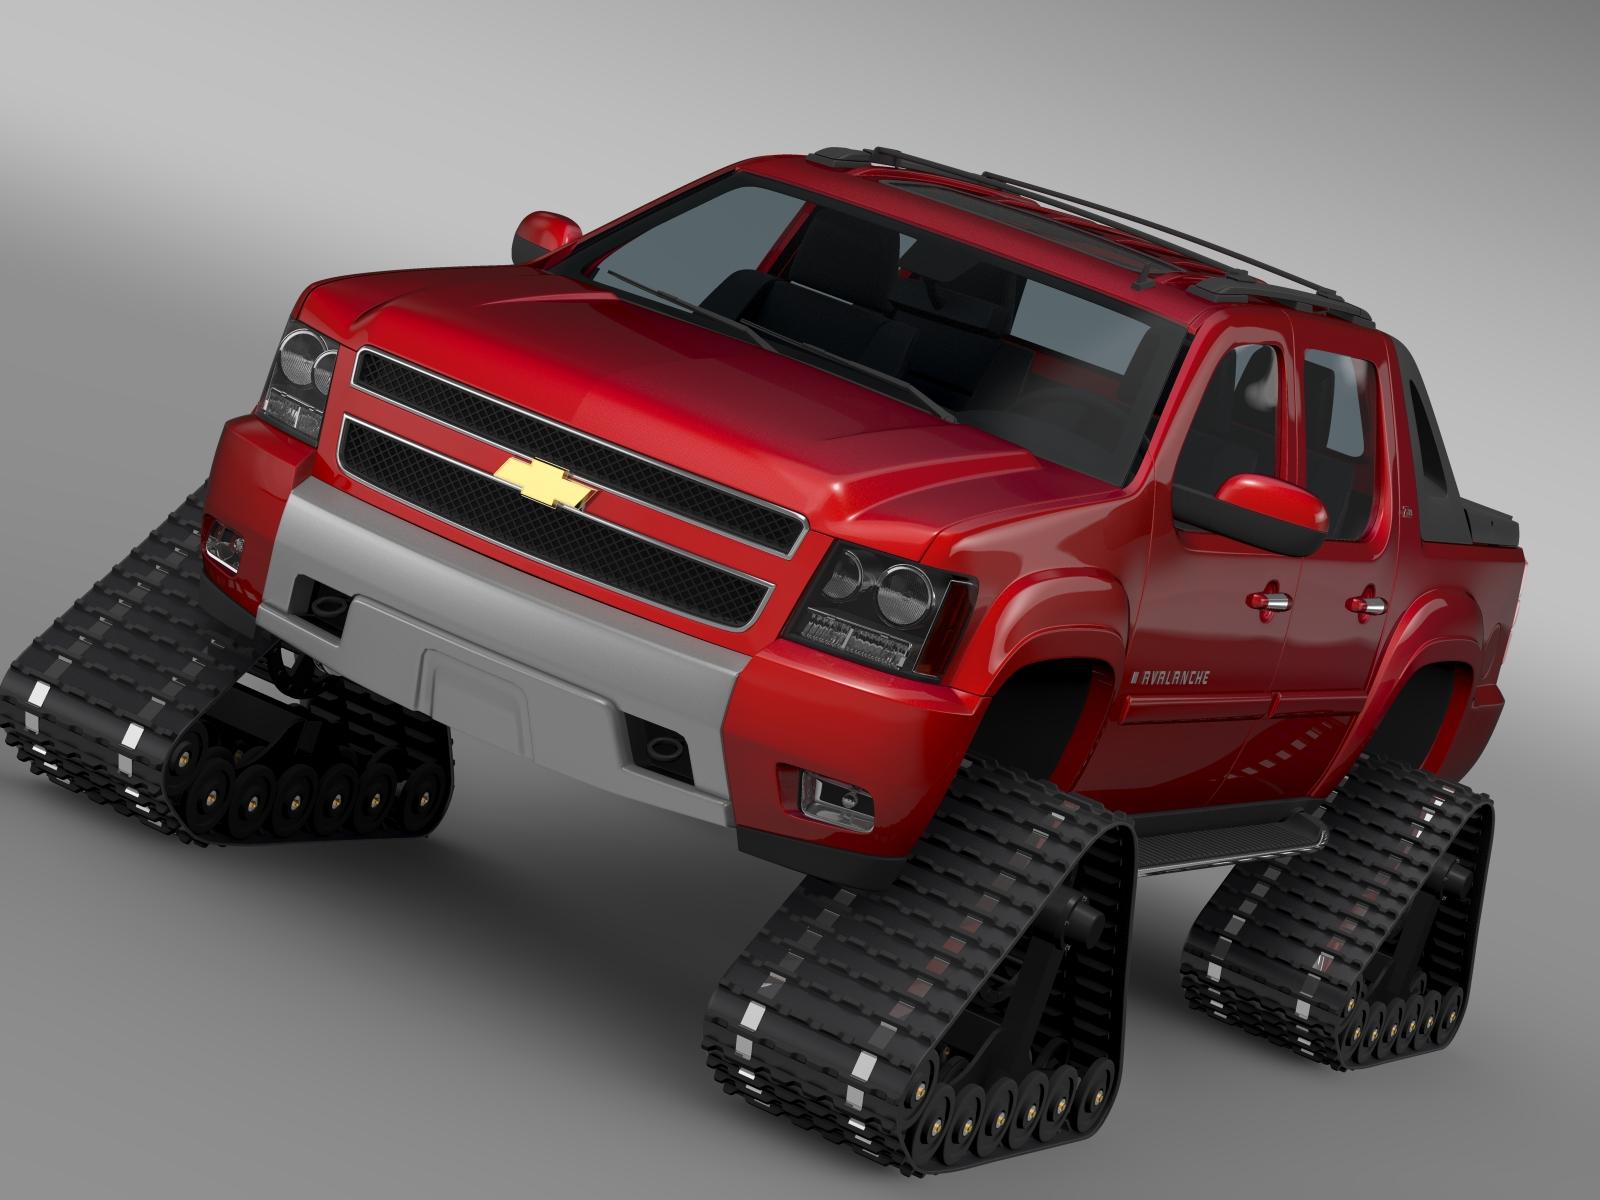 chevrolet avalanche z71 crawler 3d model 3ds max fbx c4d lwo ma mb hrc xsi obj 217844